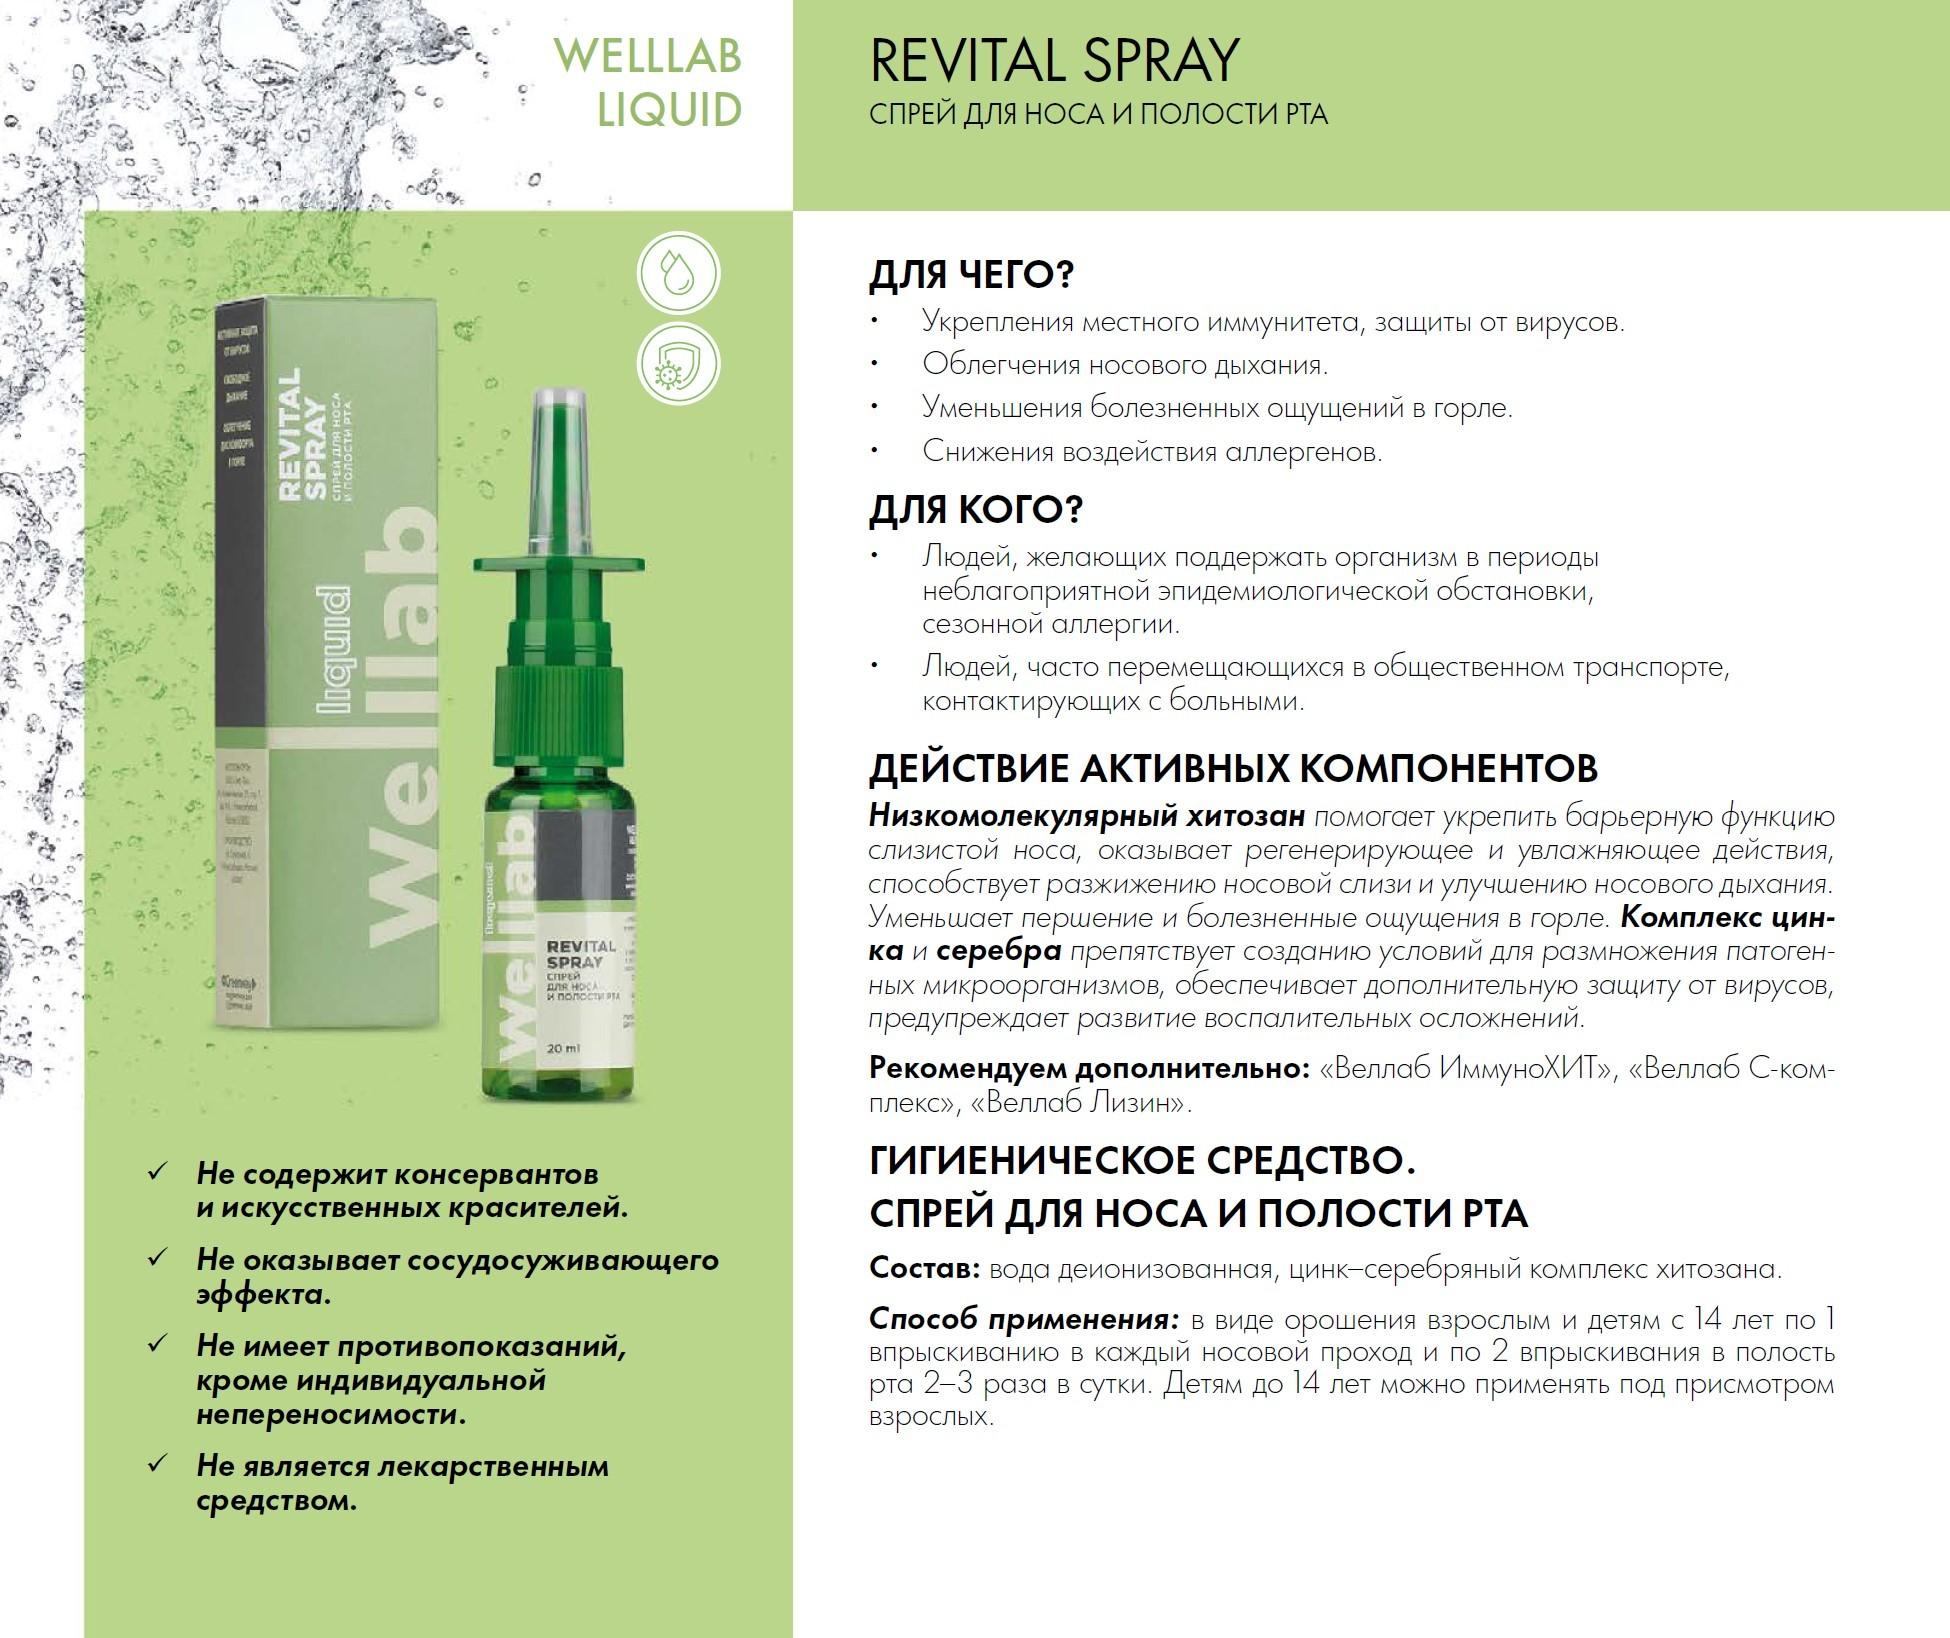 Welllab Liquid Revital Spray